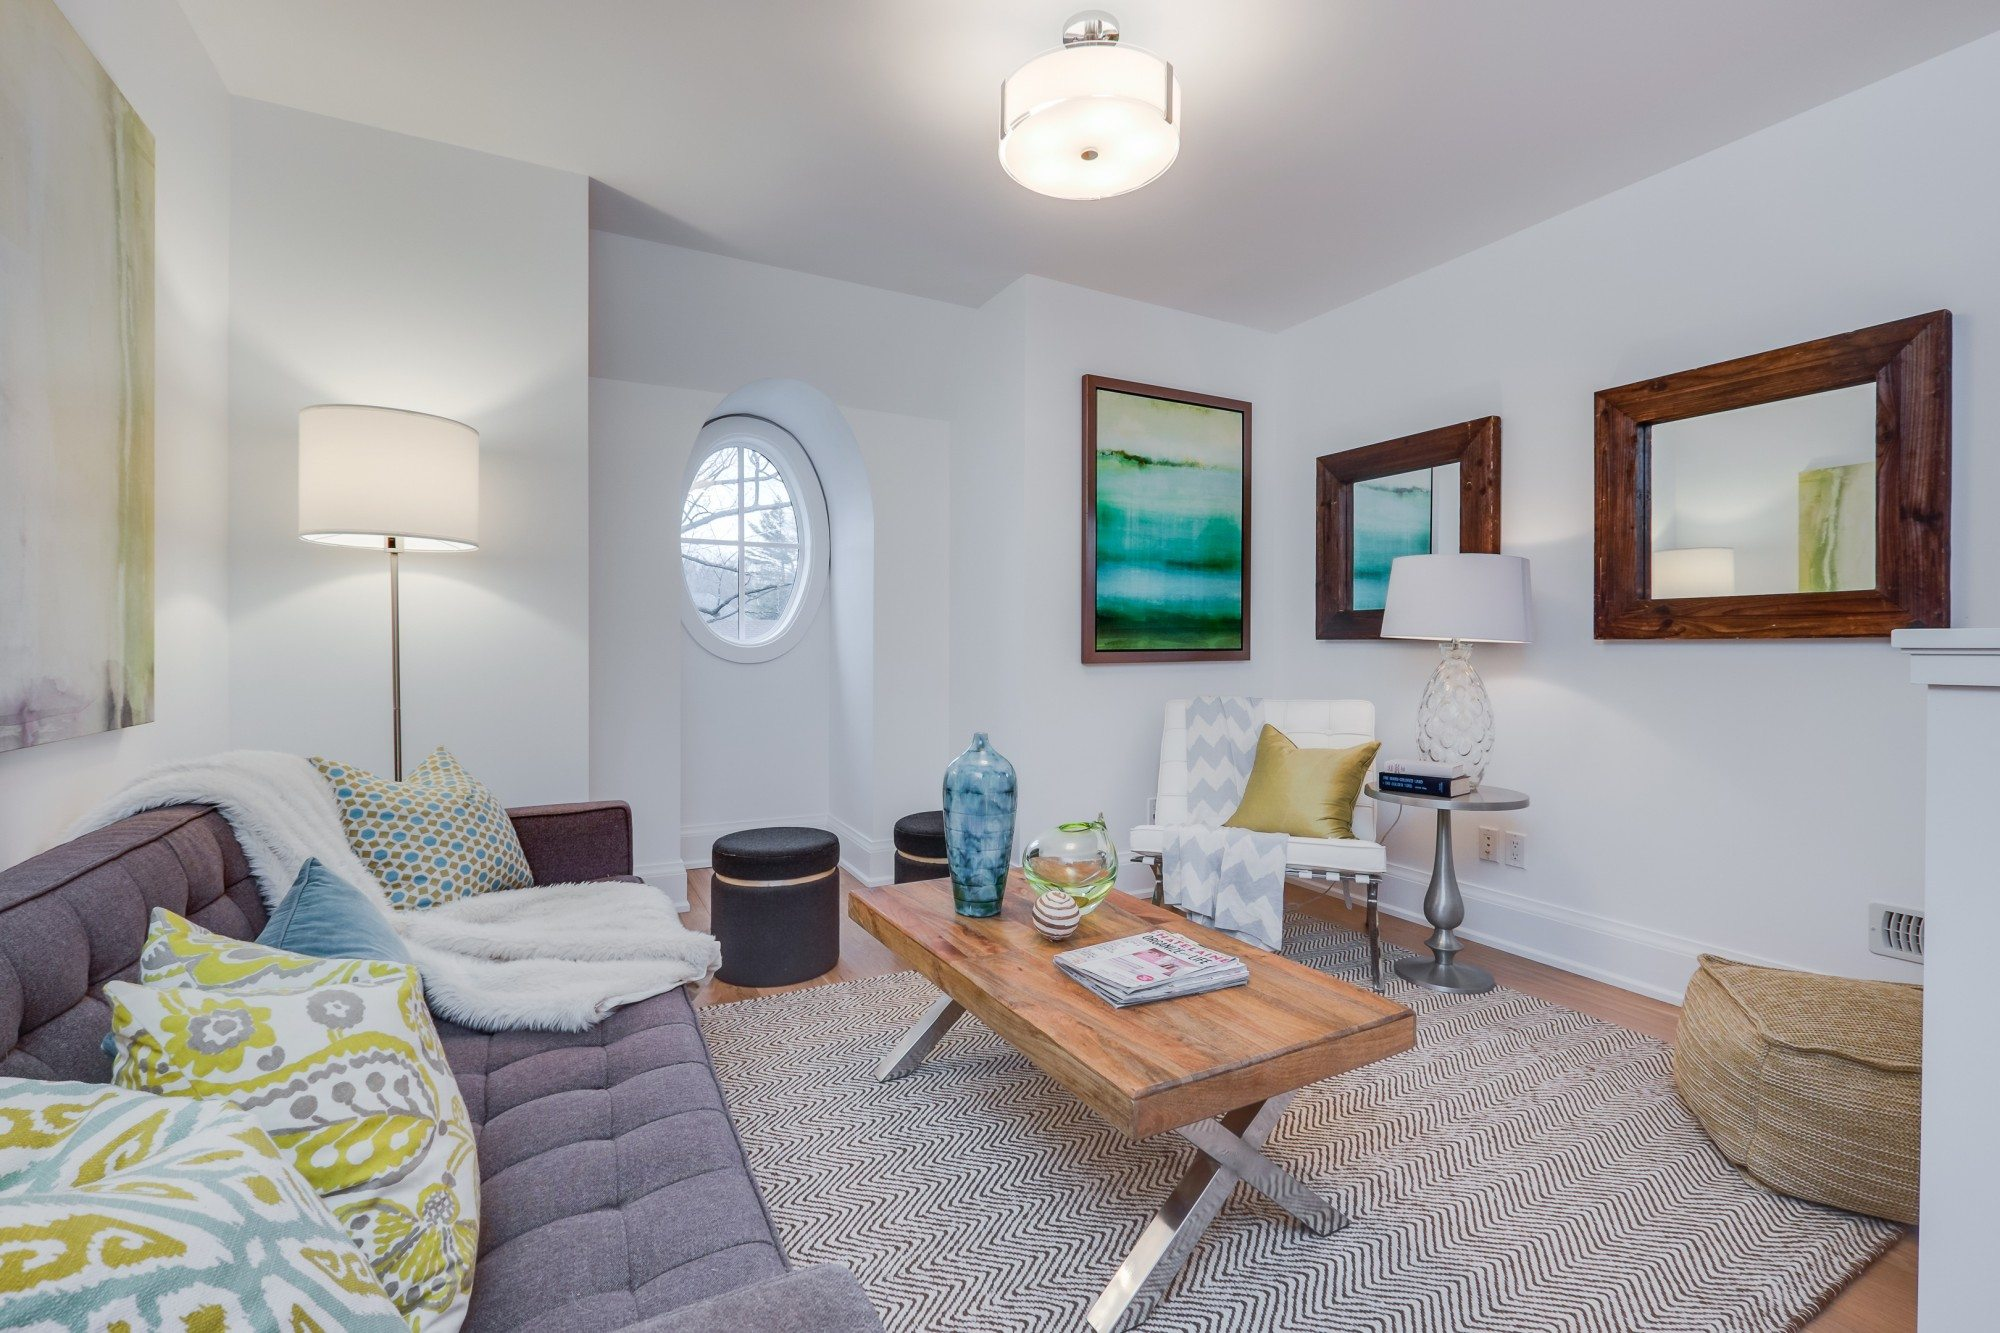 toronto-house-for-sale-105-pine-glen-road-15